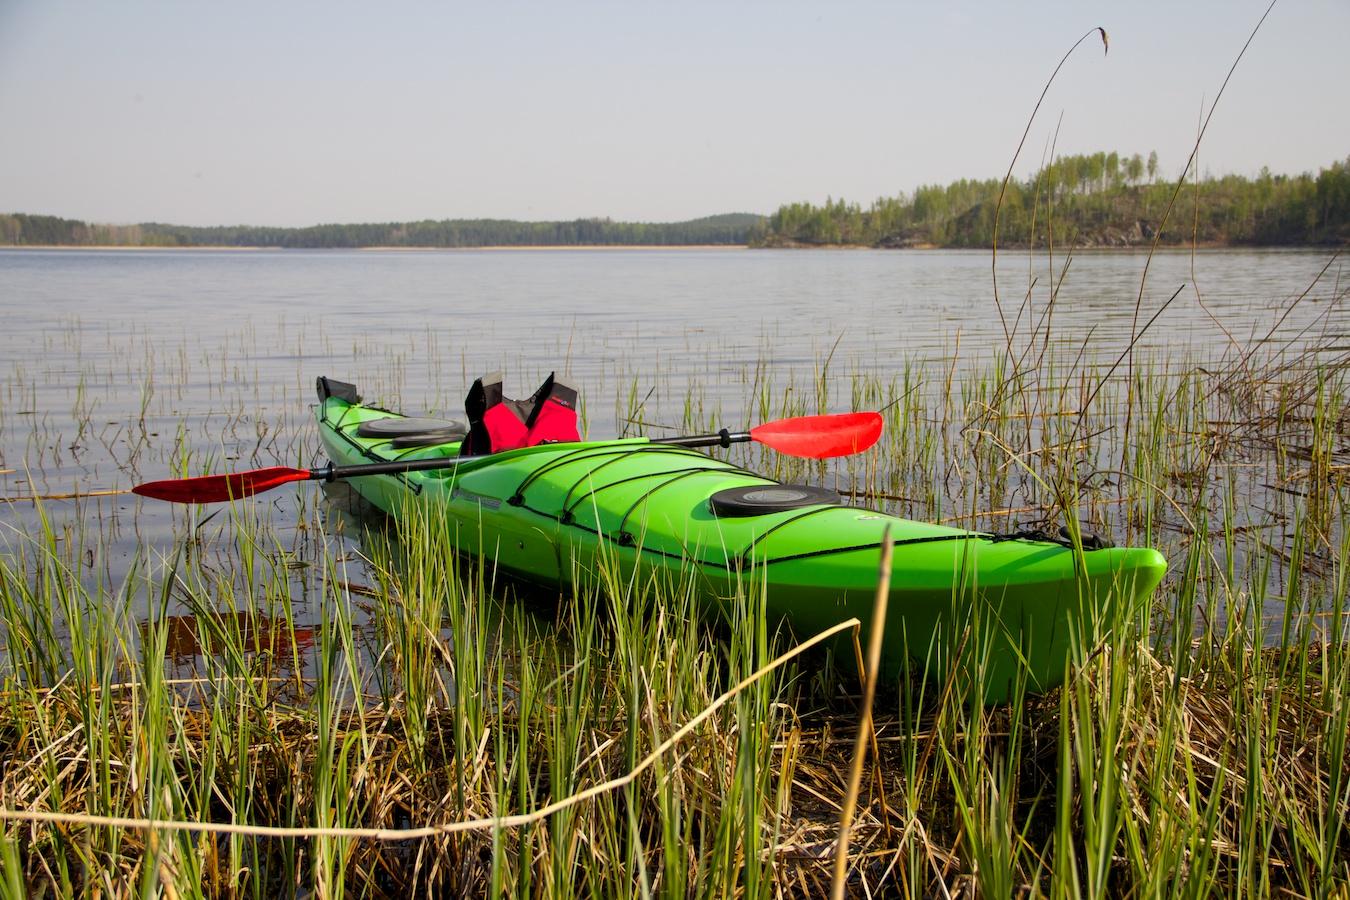 tsunami 145 polietilenovye kayaki naprokat